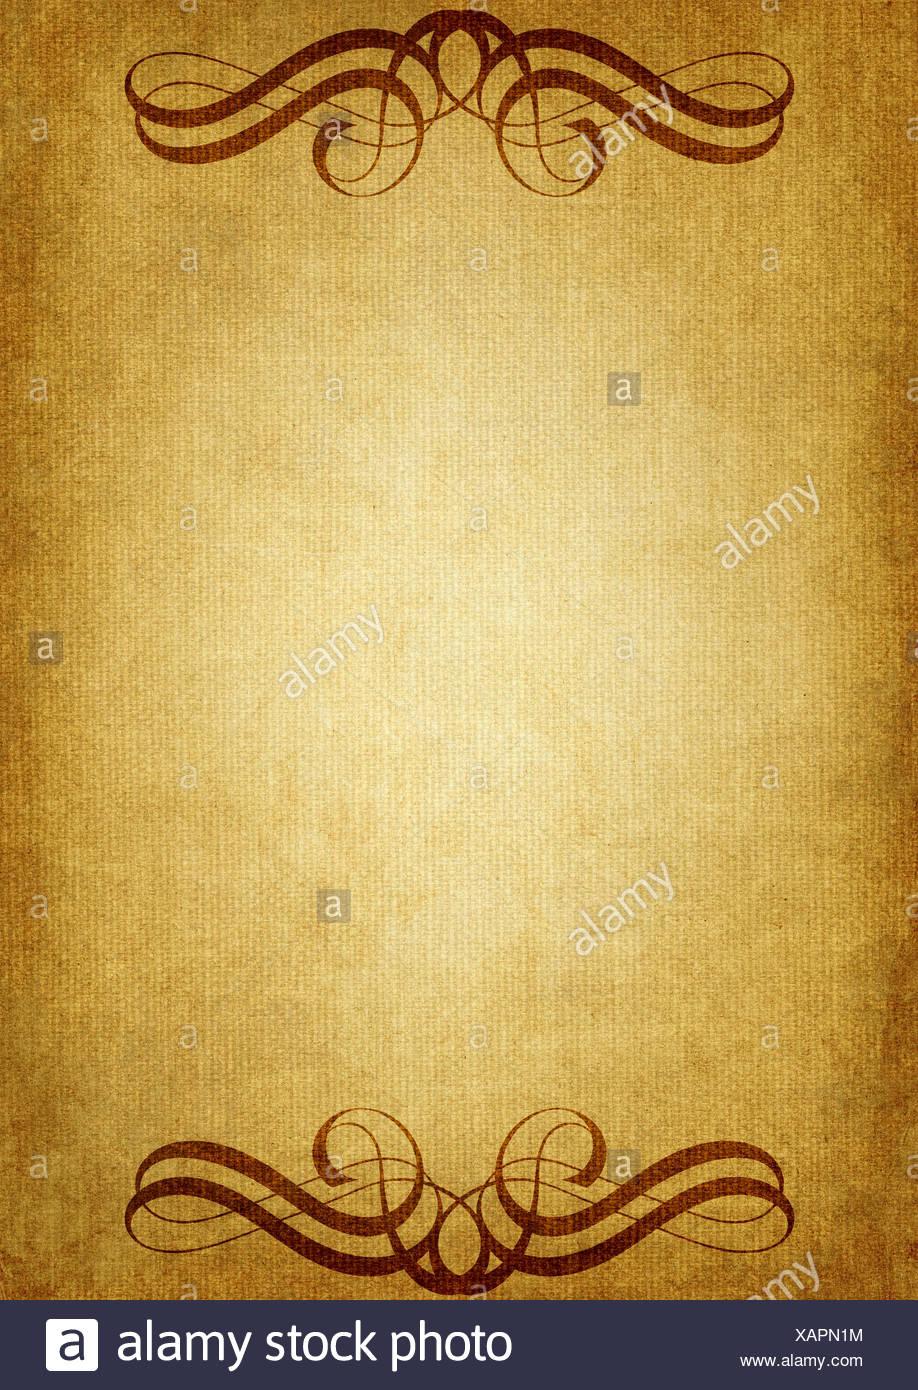 old paper design Stock Photo: 282011904 - Alamy